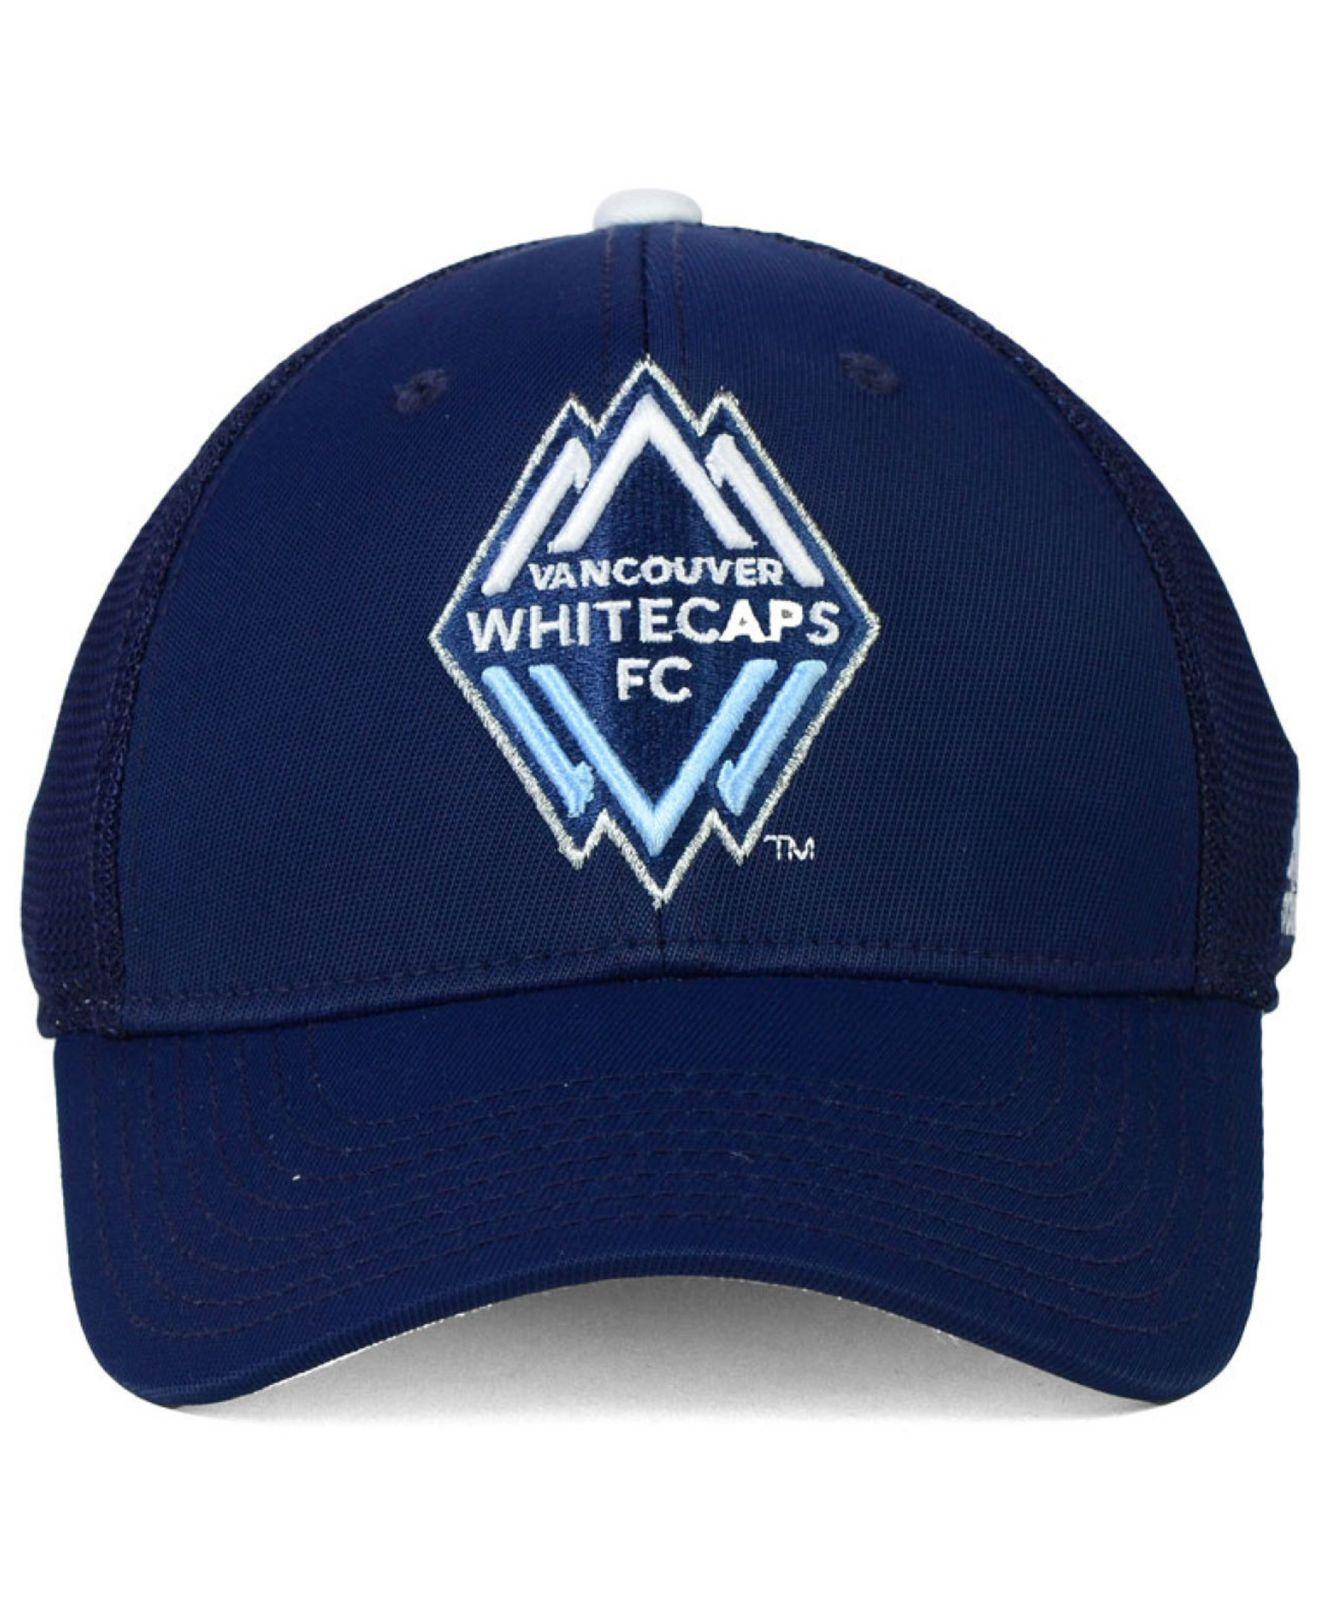 f763b89b1de Lyst - adidas Originals Vancouver Whitecaps Evolution Bucket Hat in ...